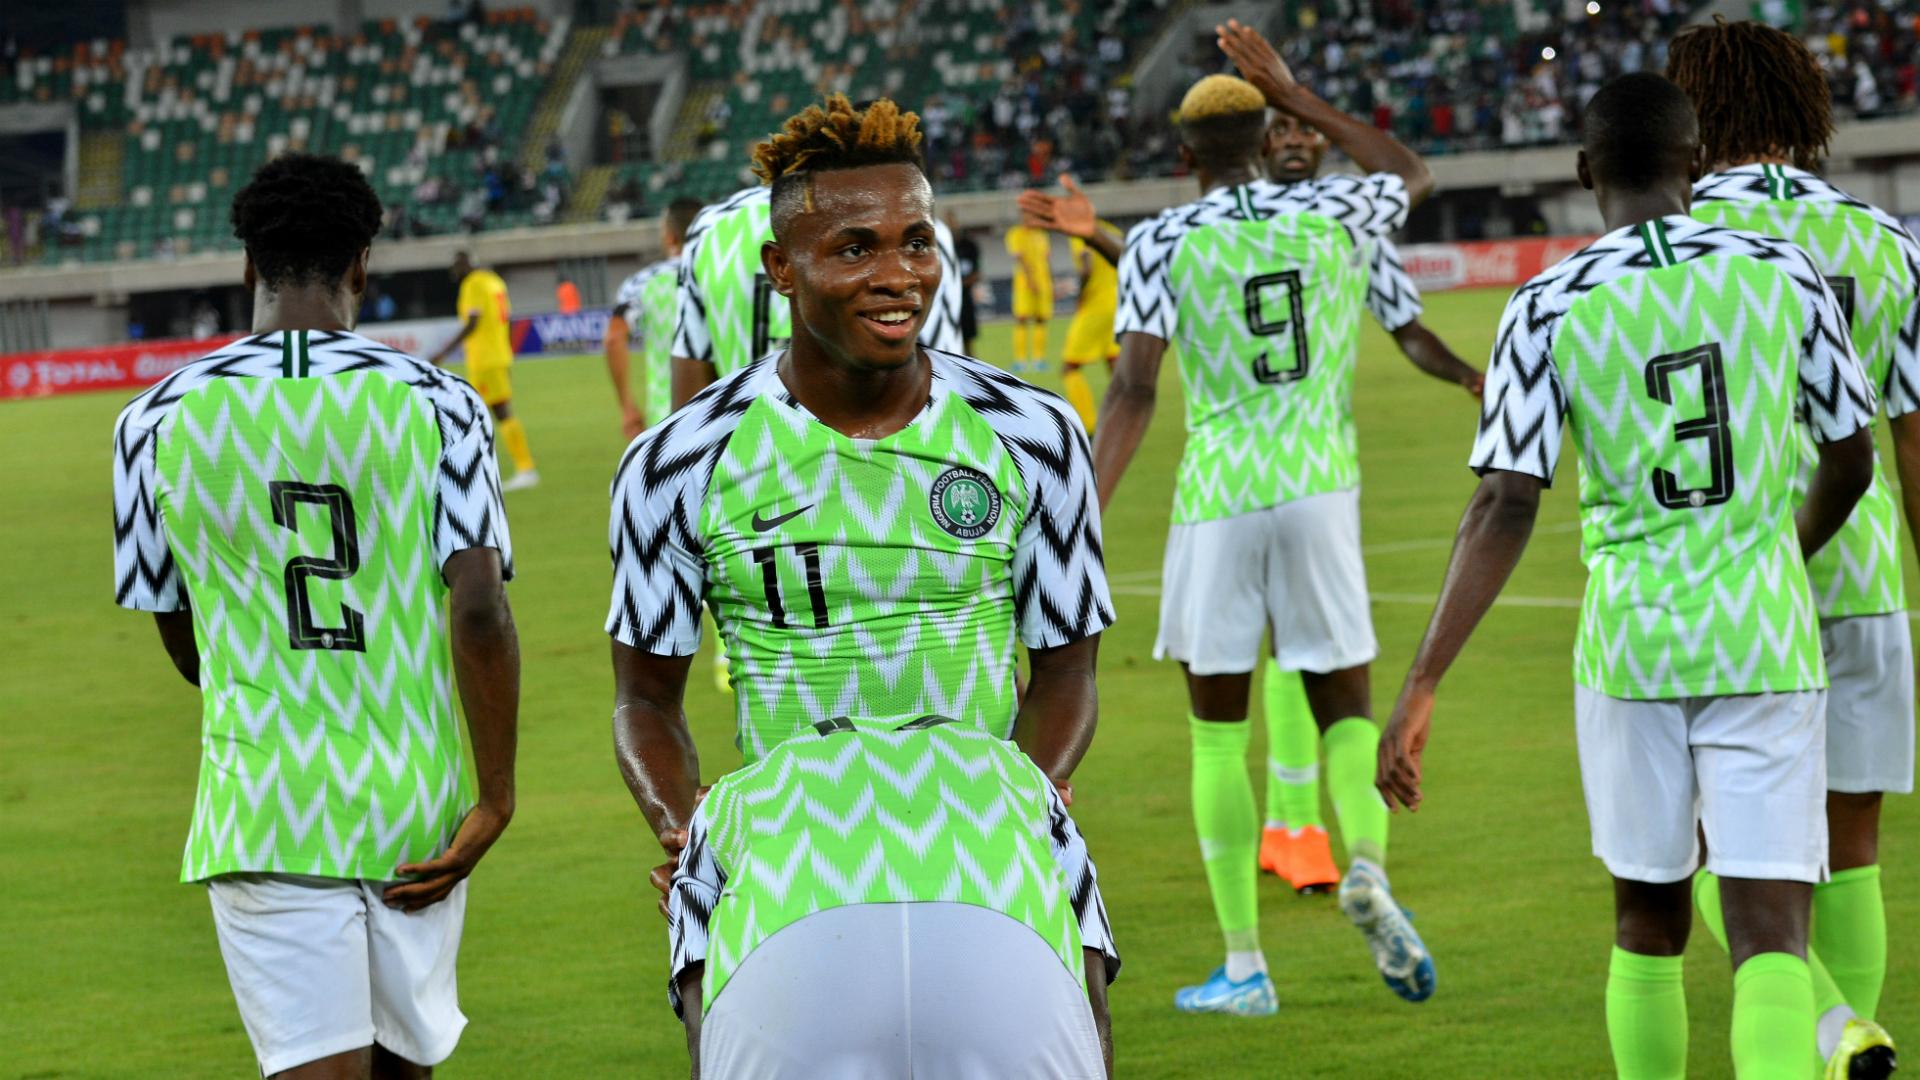 Nigeria vs Algeria: Where the game will be won and lost